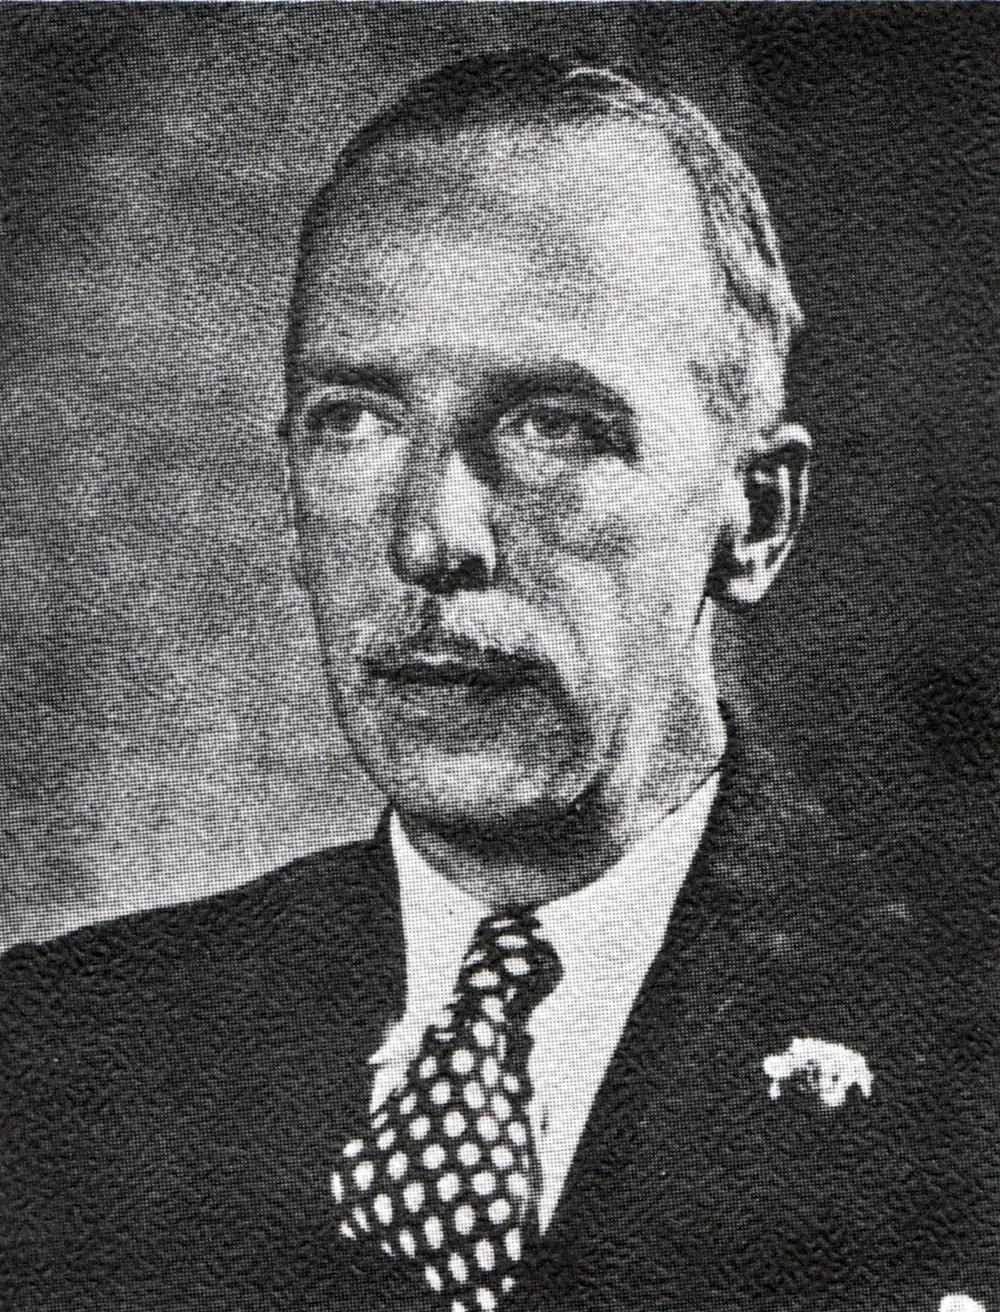 George W. Chapman